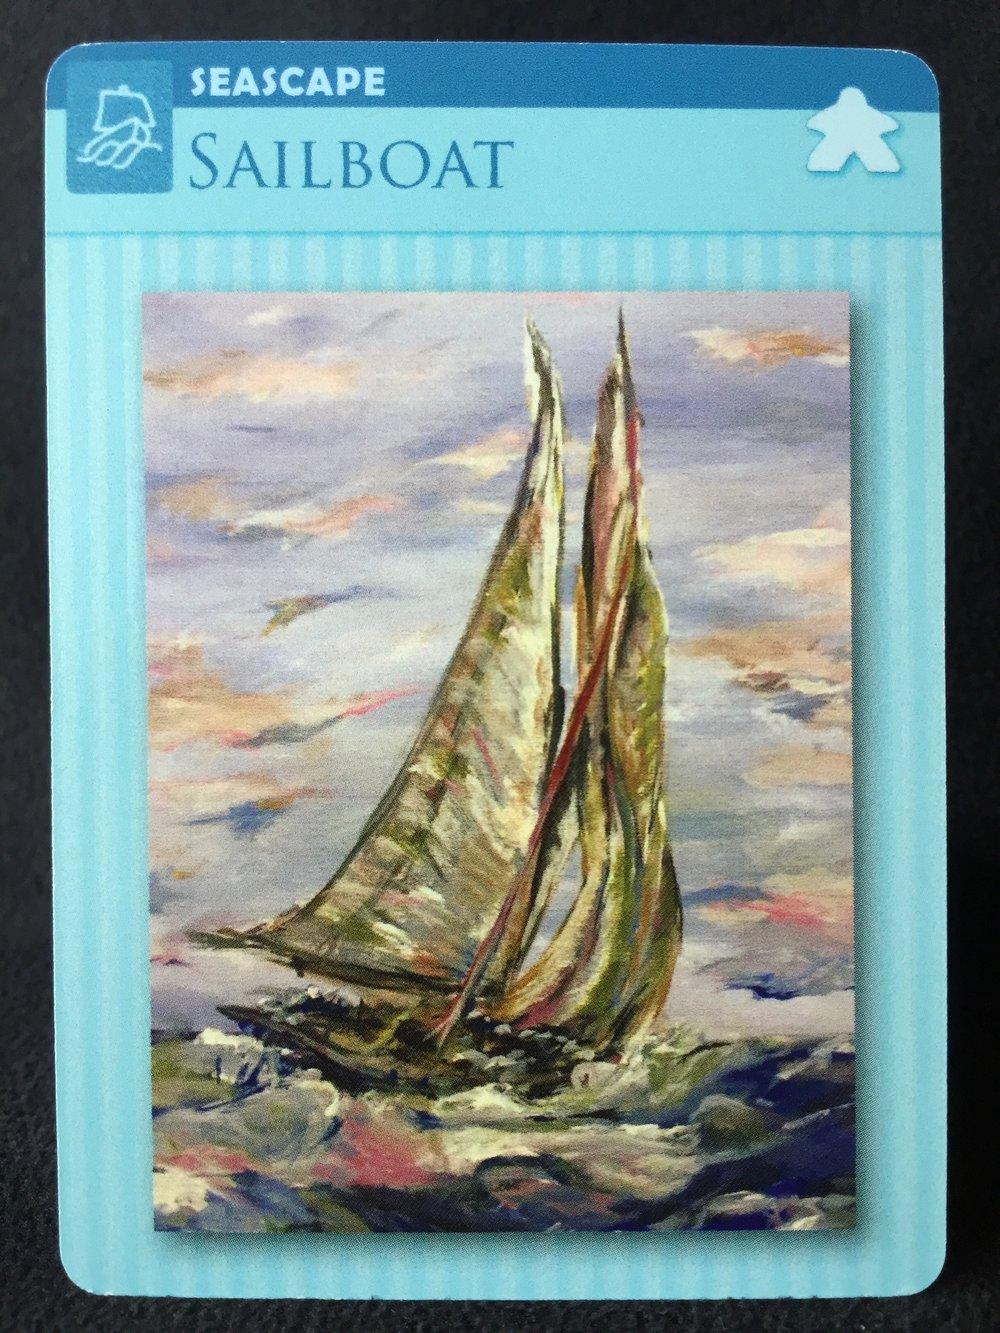 seascape sailboat.jpeg